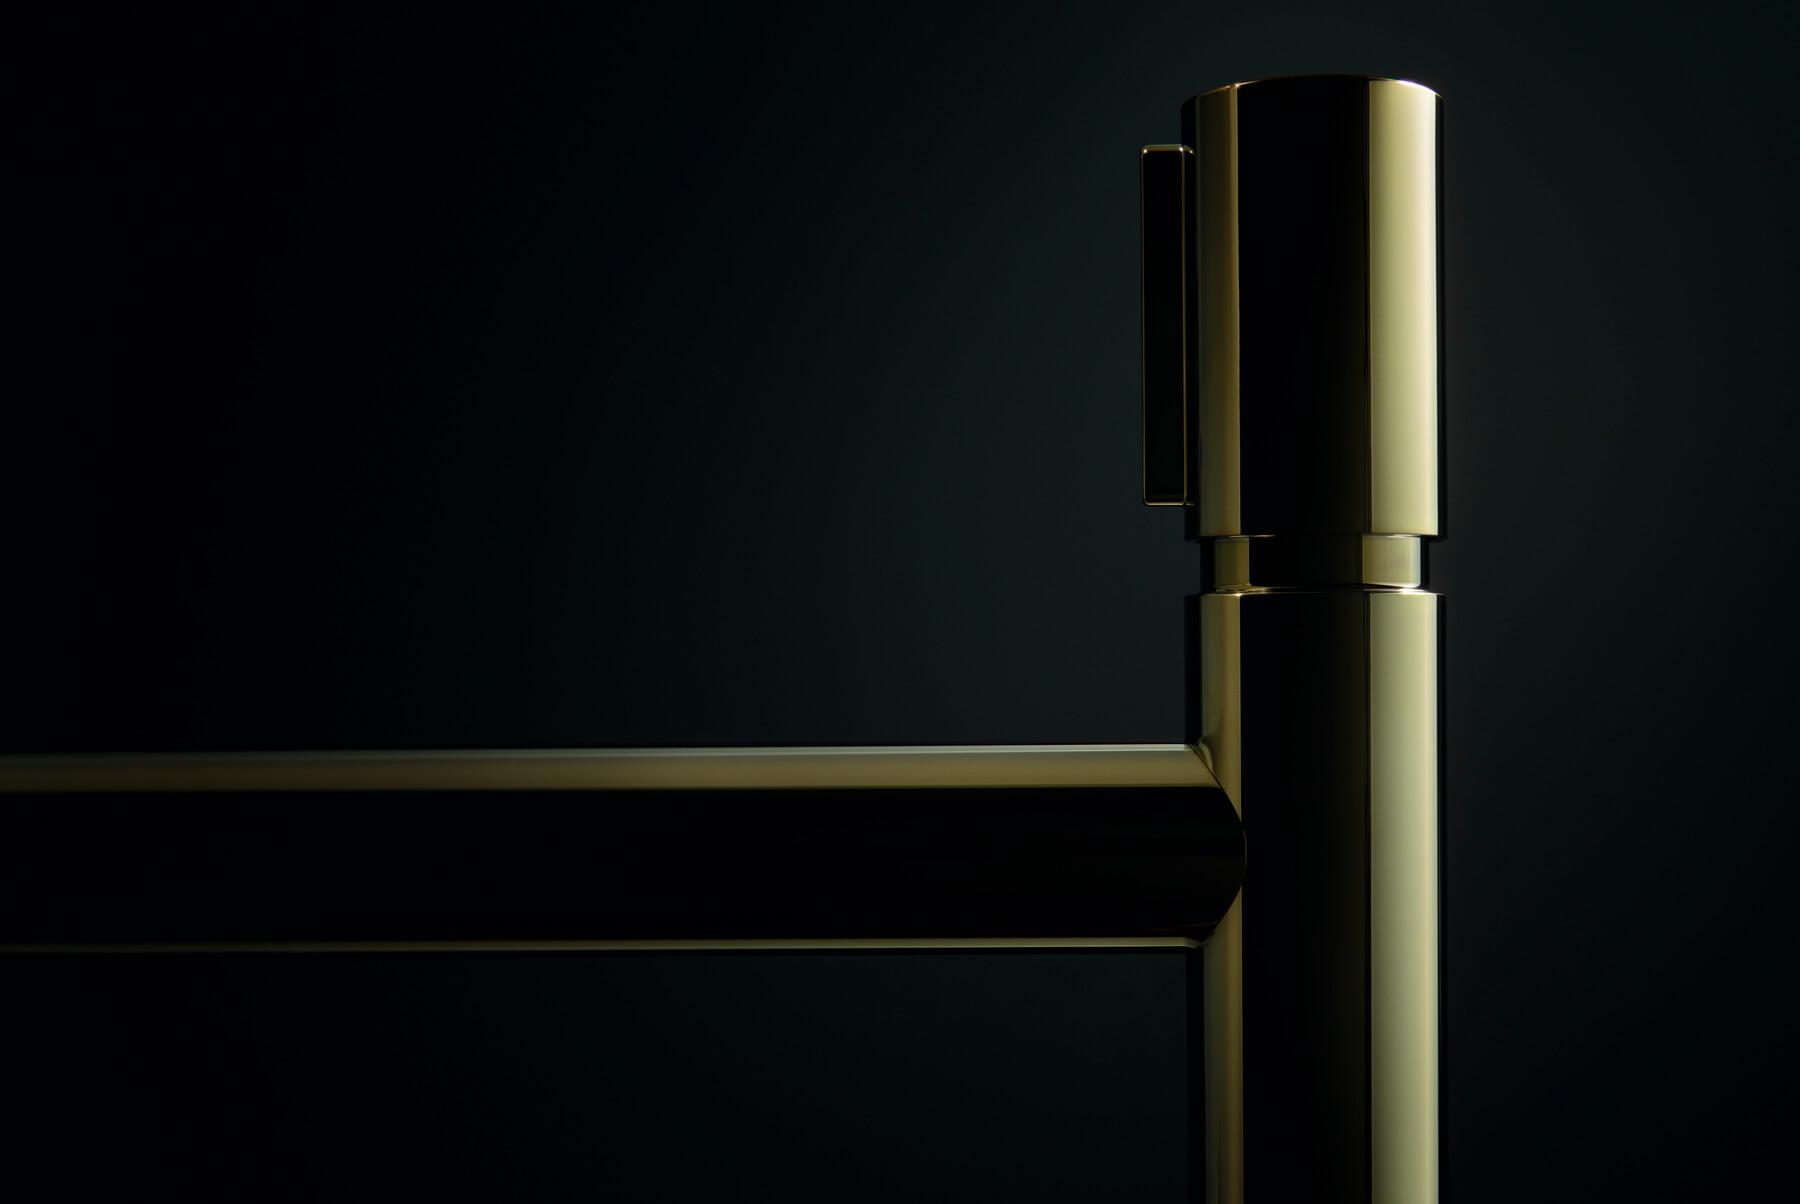 Brassware-AXOR-UNO-INSET-14-1800x1204